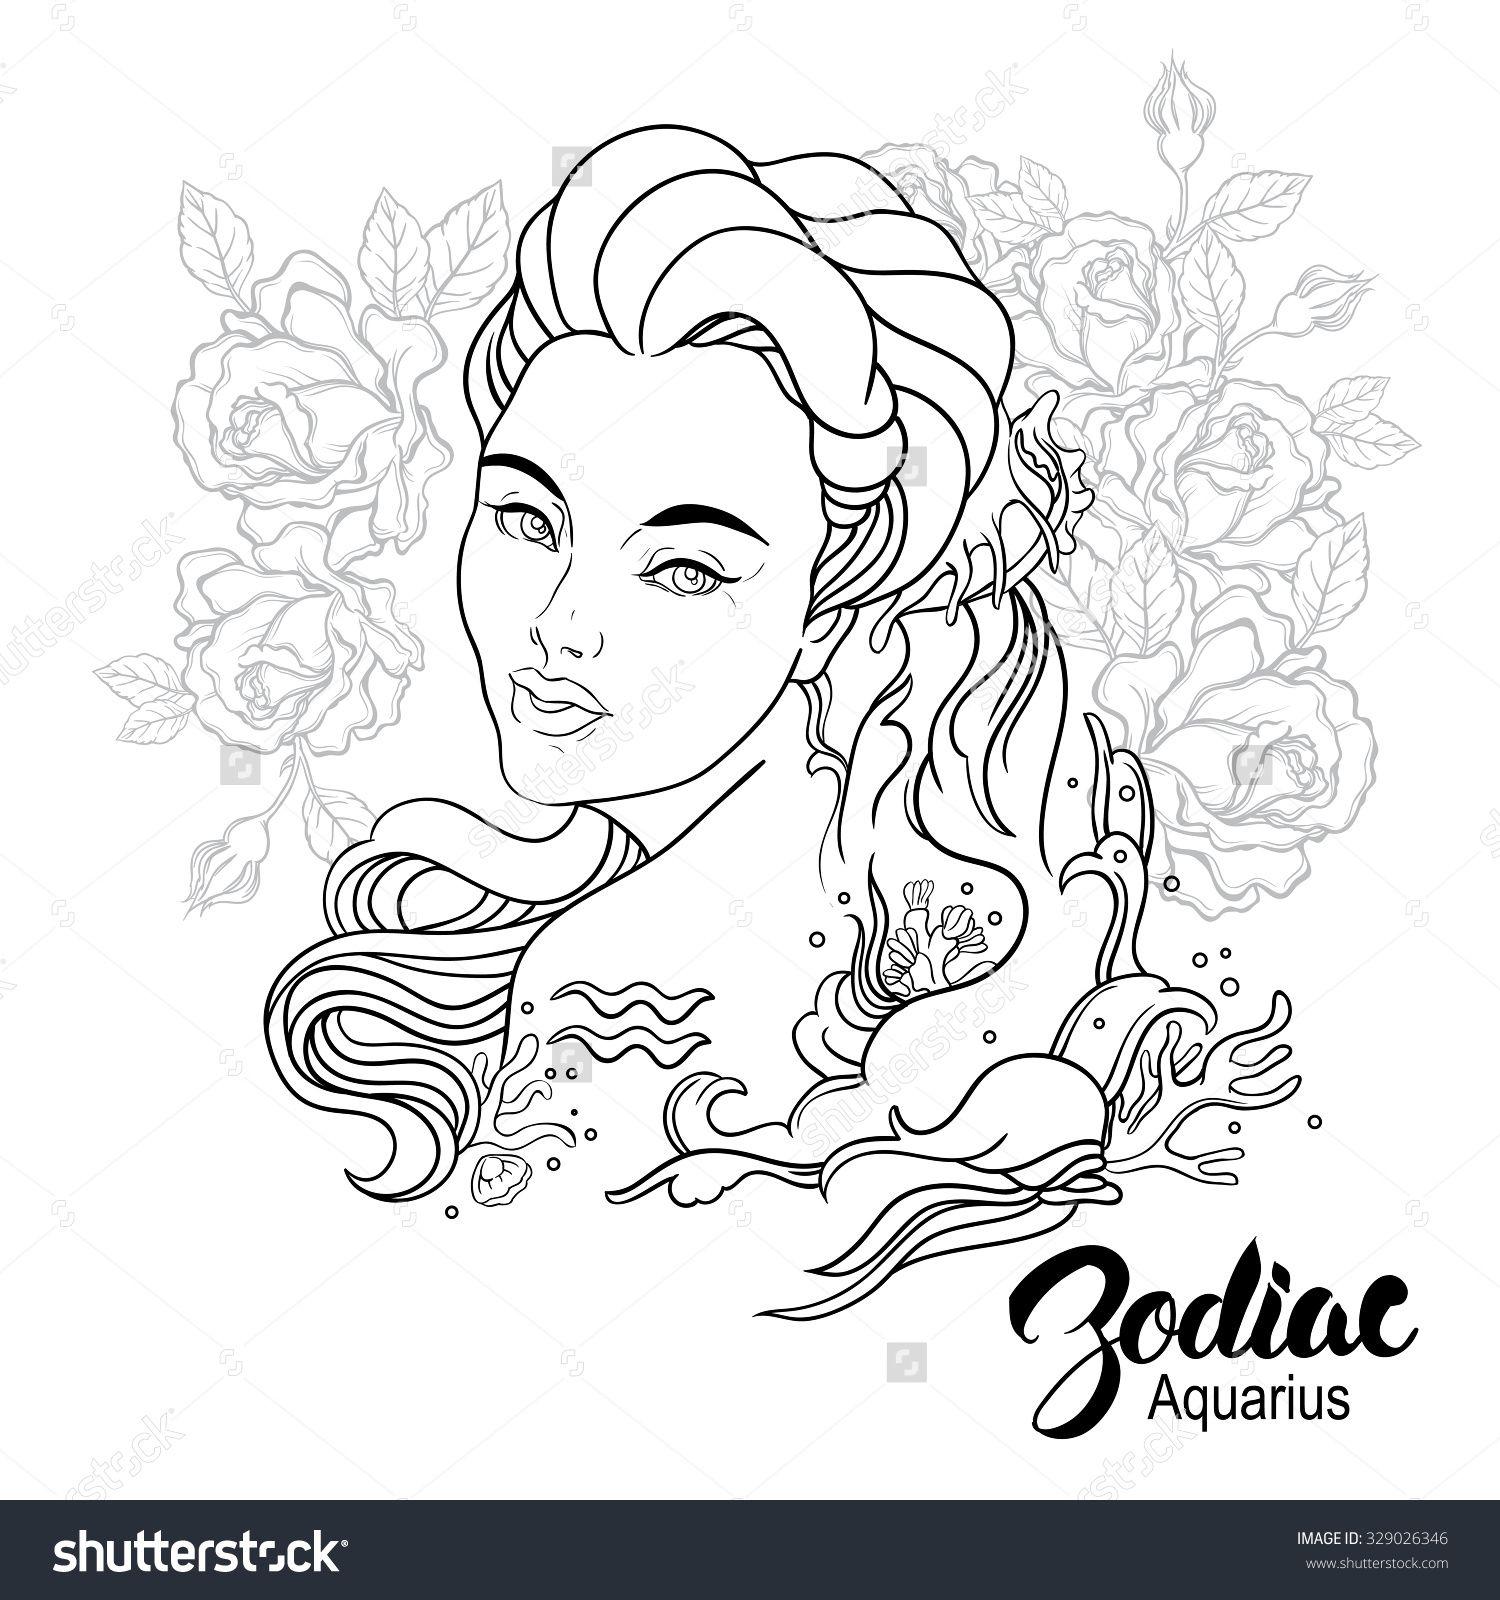 1500x1600 Stock Photo Zodiac Illustration Of Aquarius As Girl With Flowers